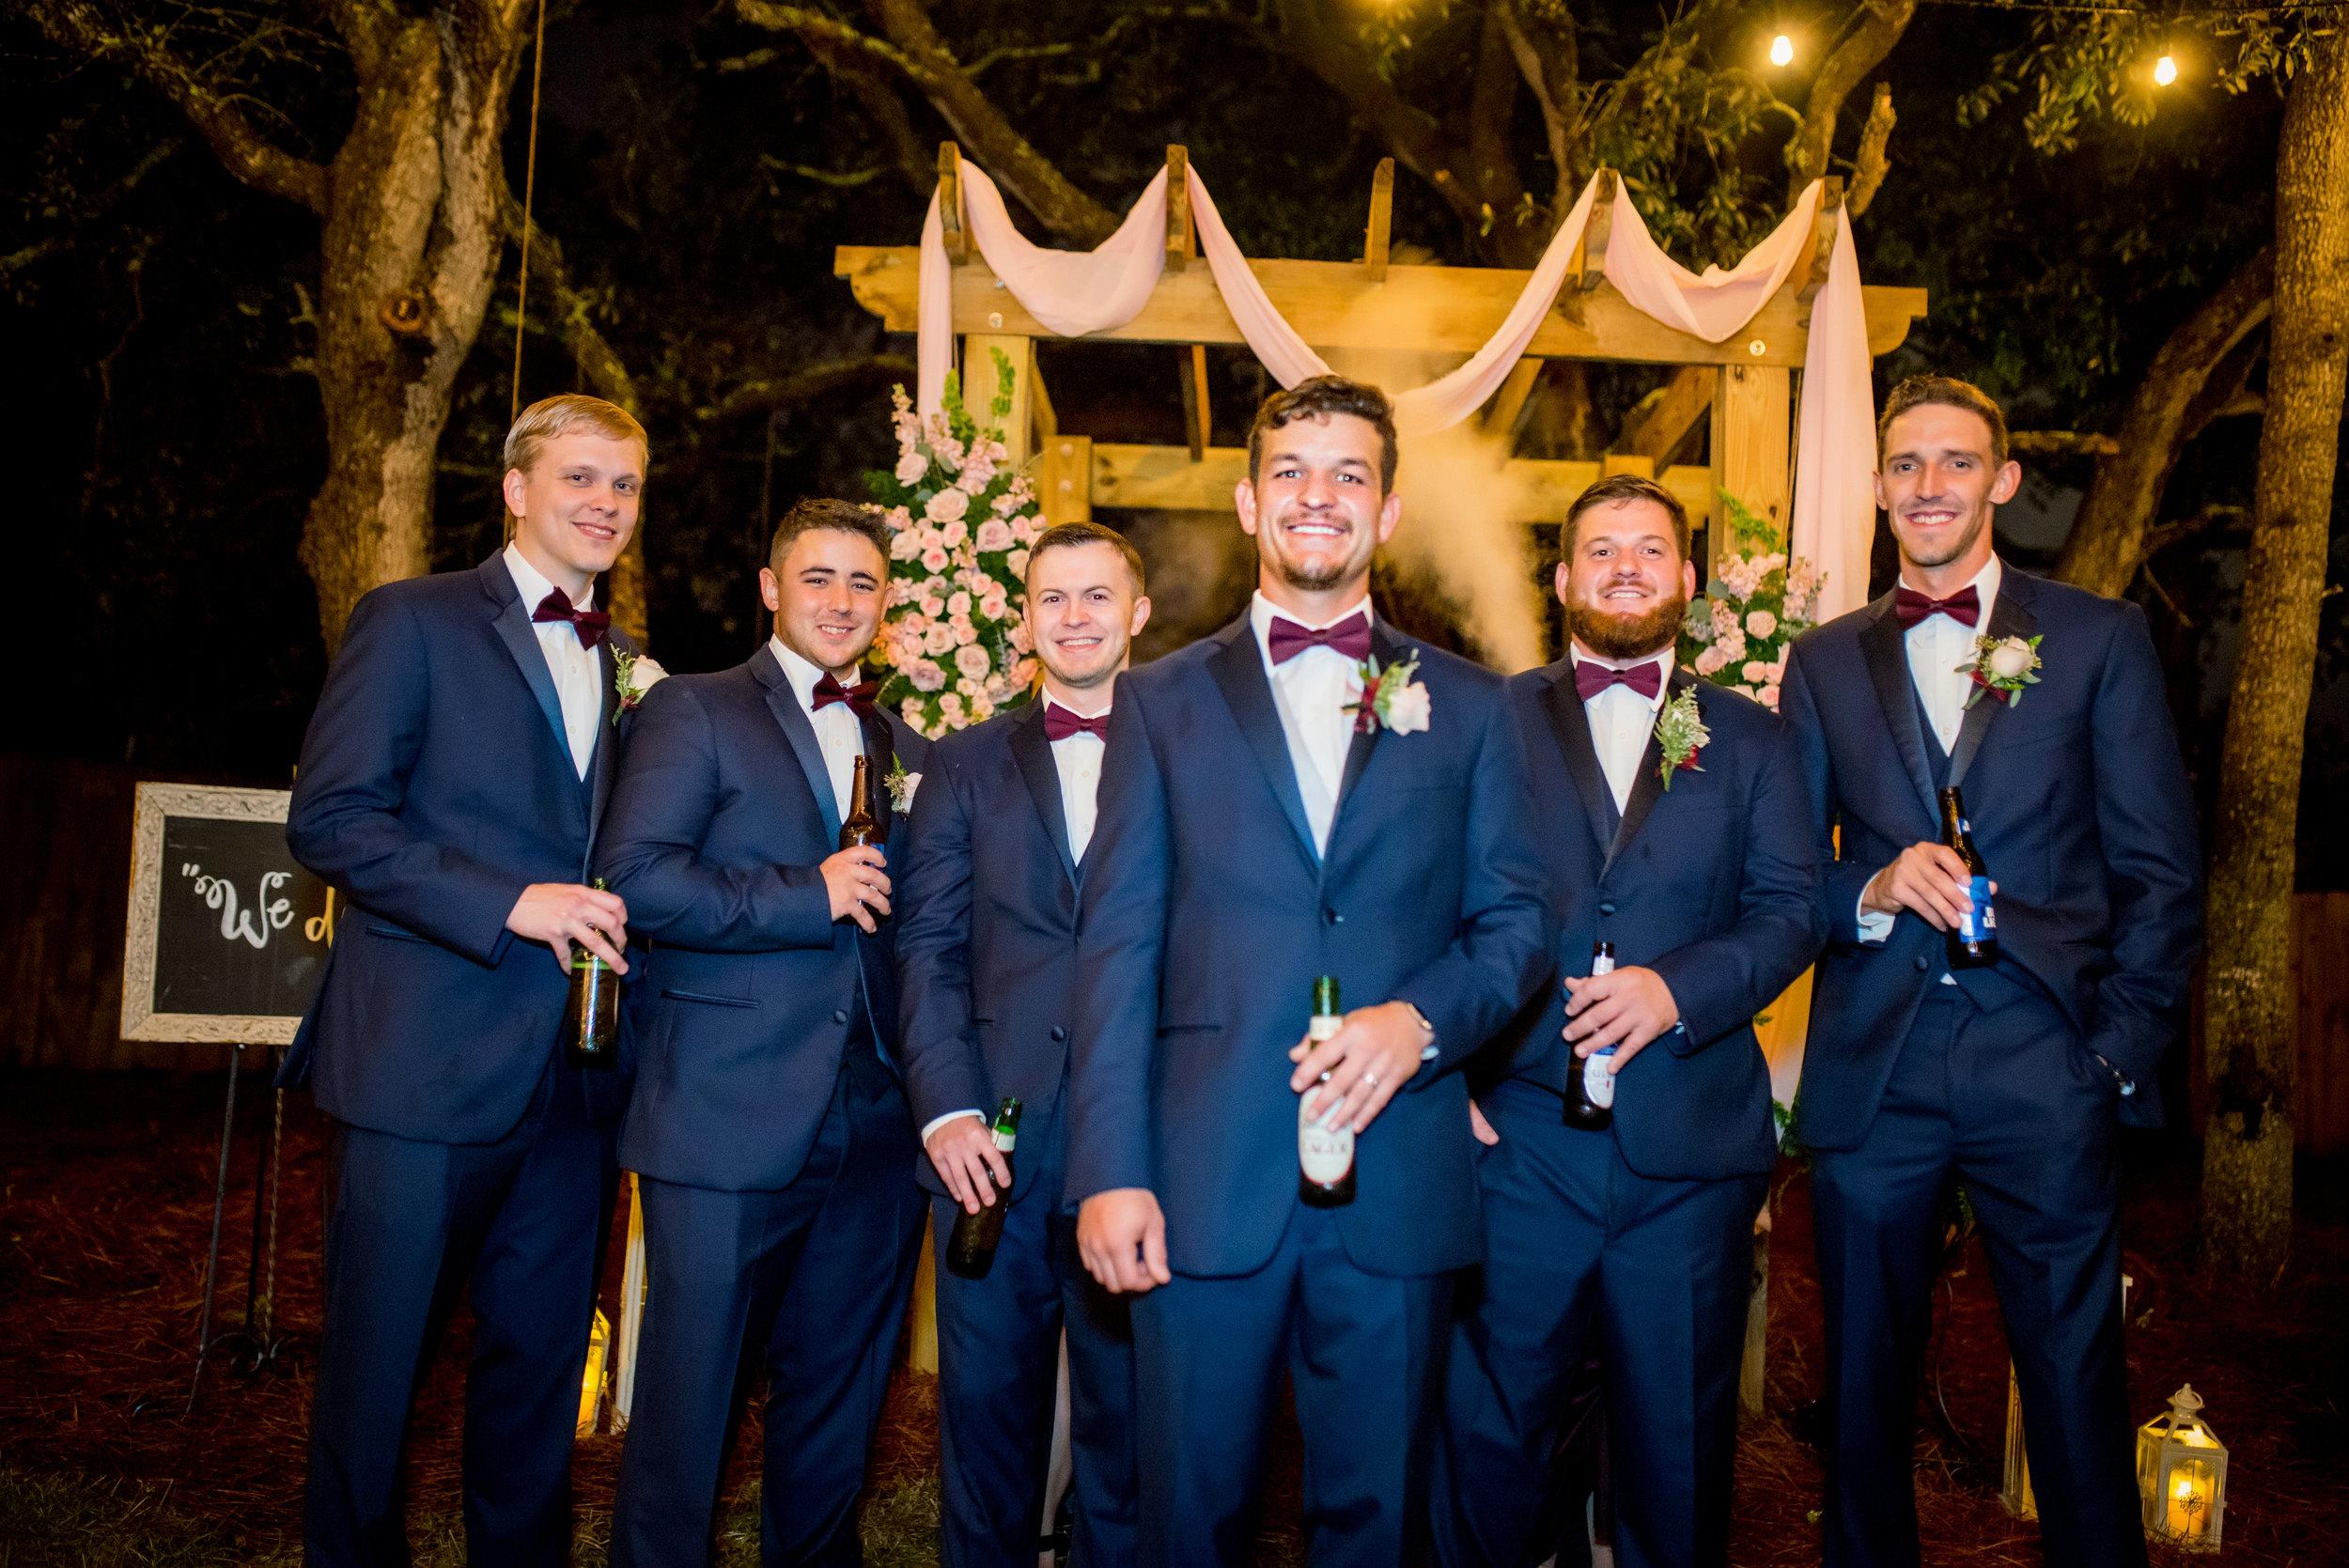 destin FL wedding.JPG